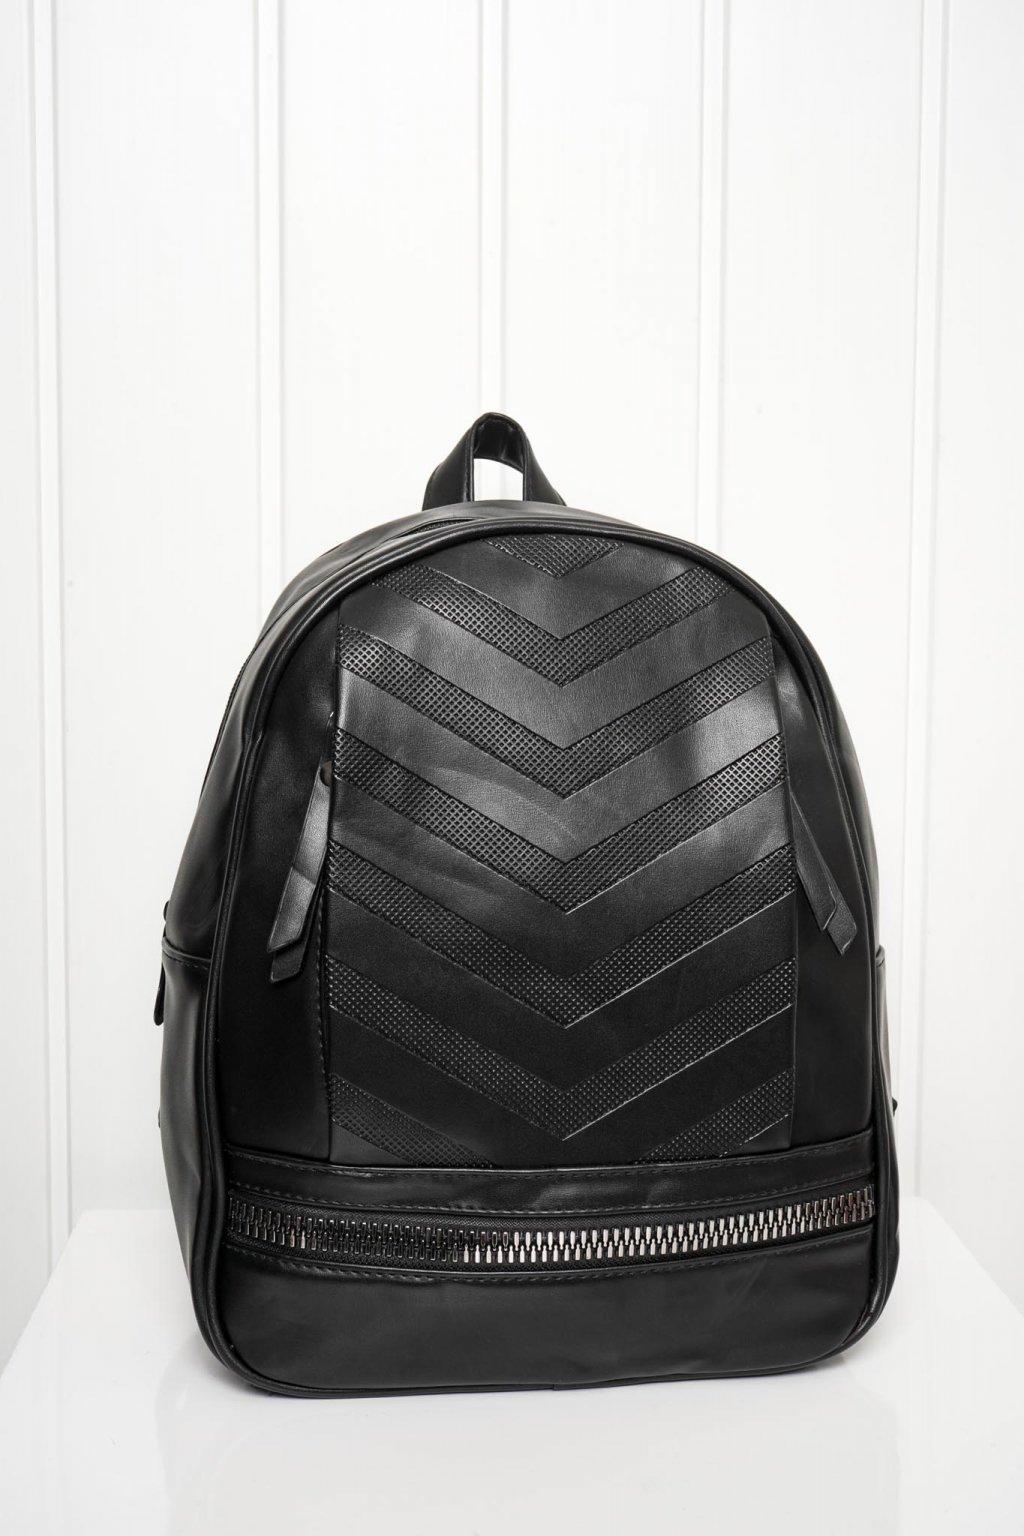 Kabelka, crossbody, ruksak, shopping bag, shopperka, 400